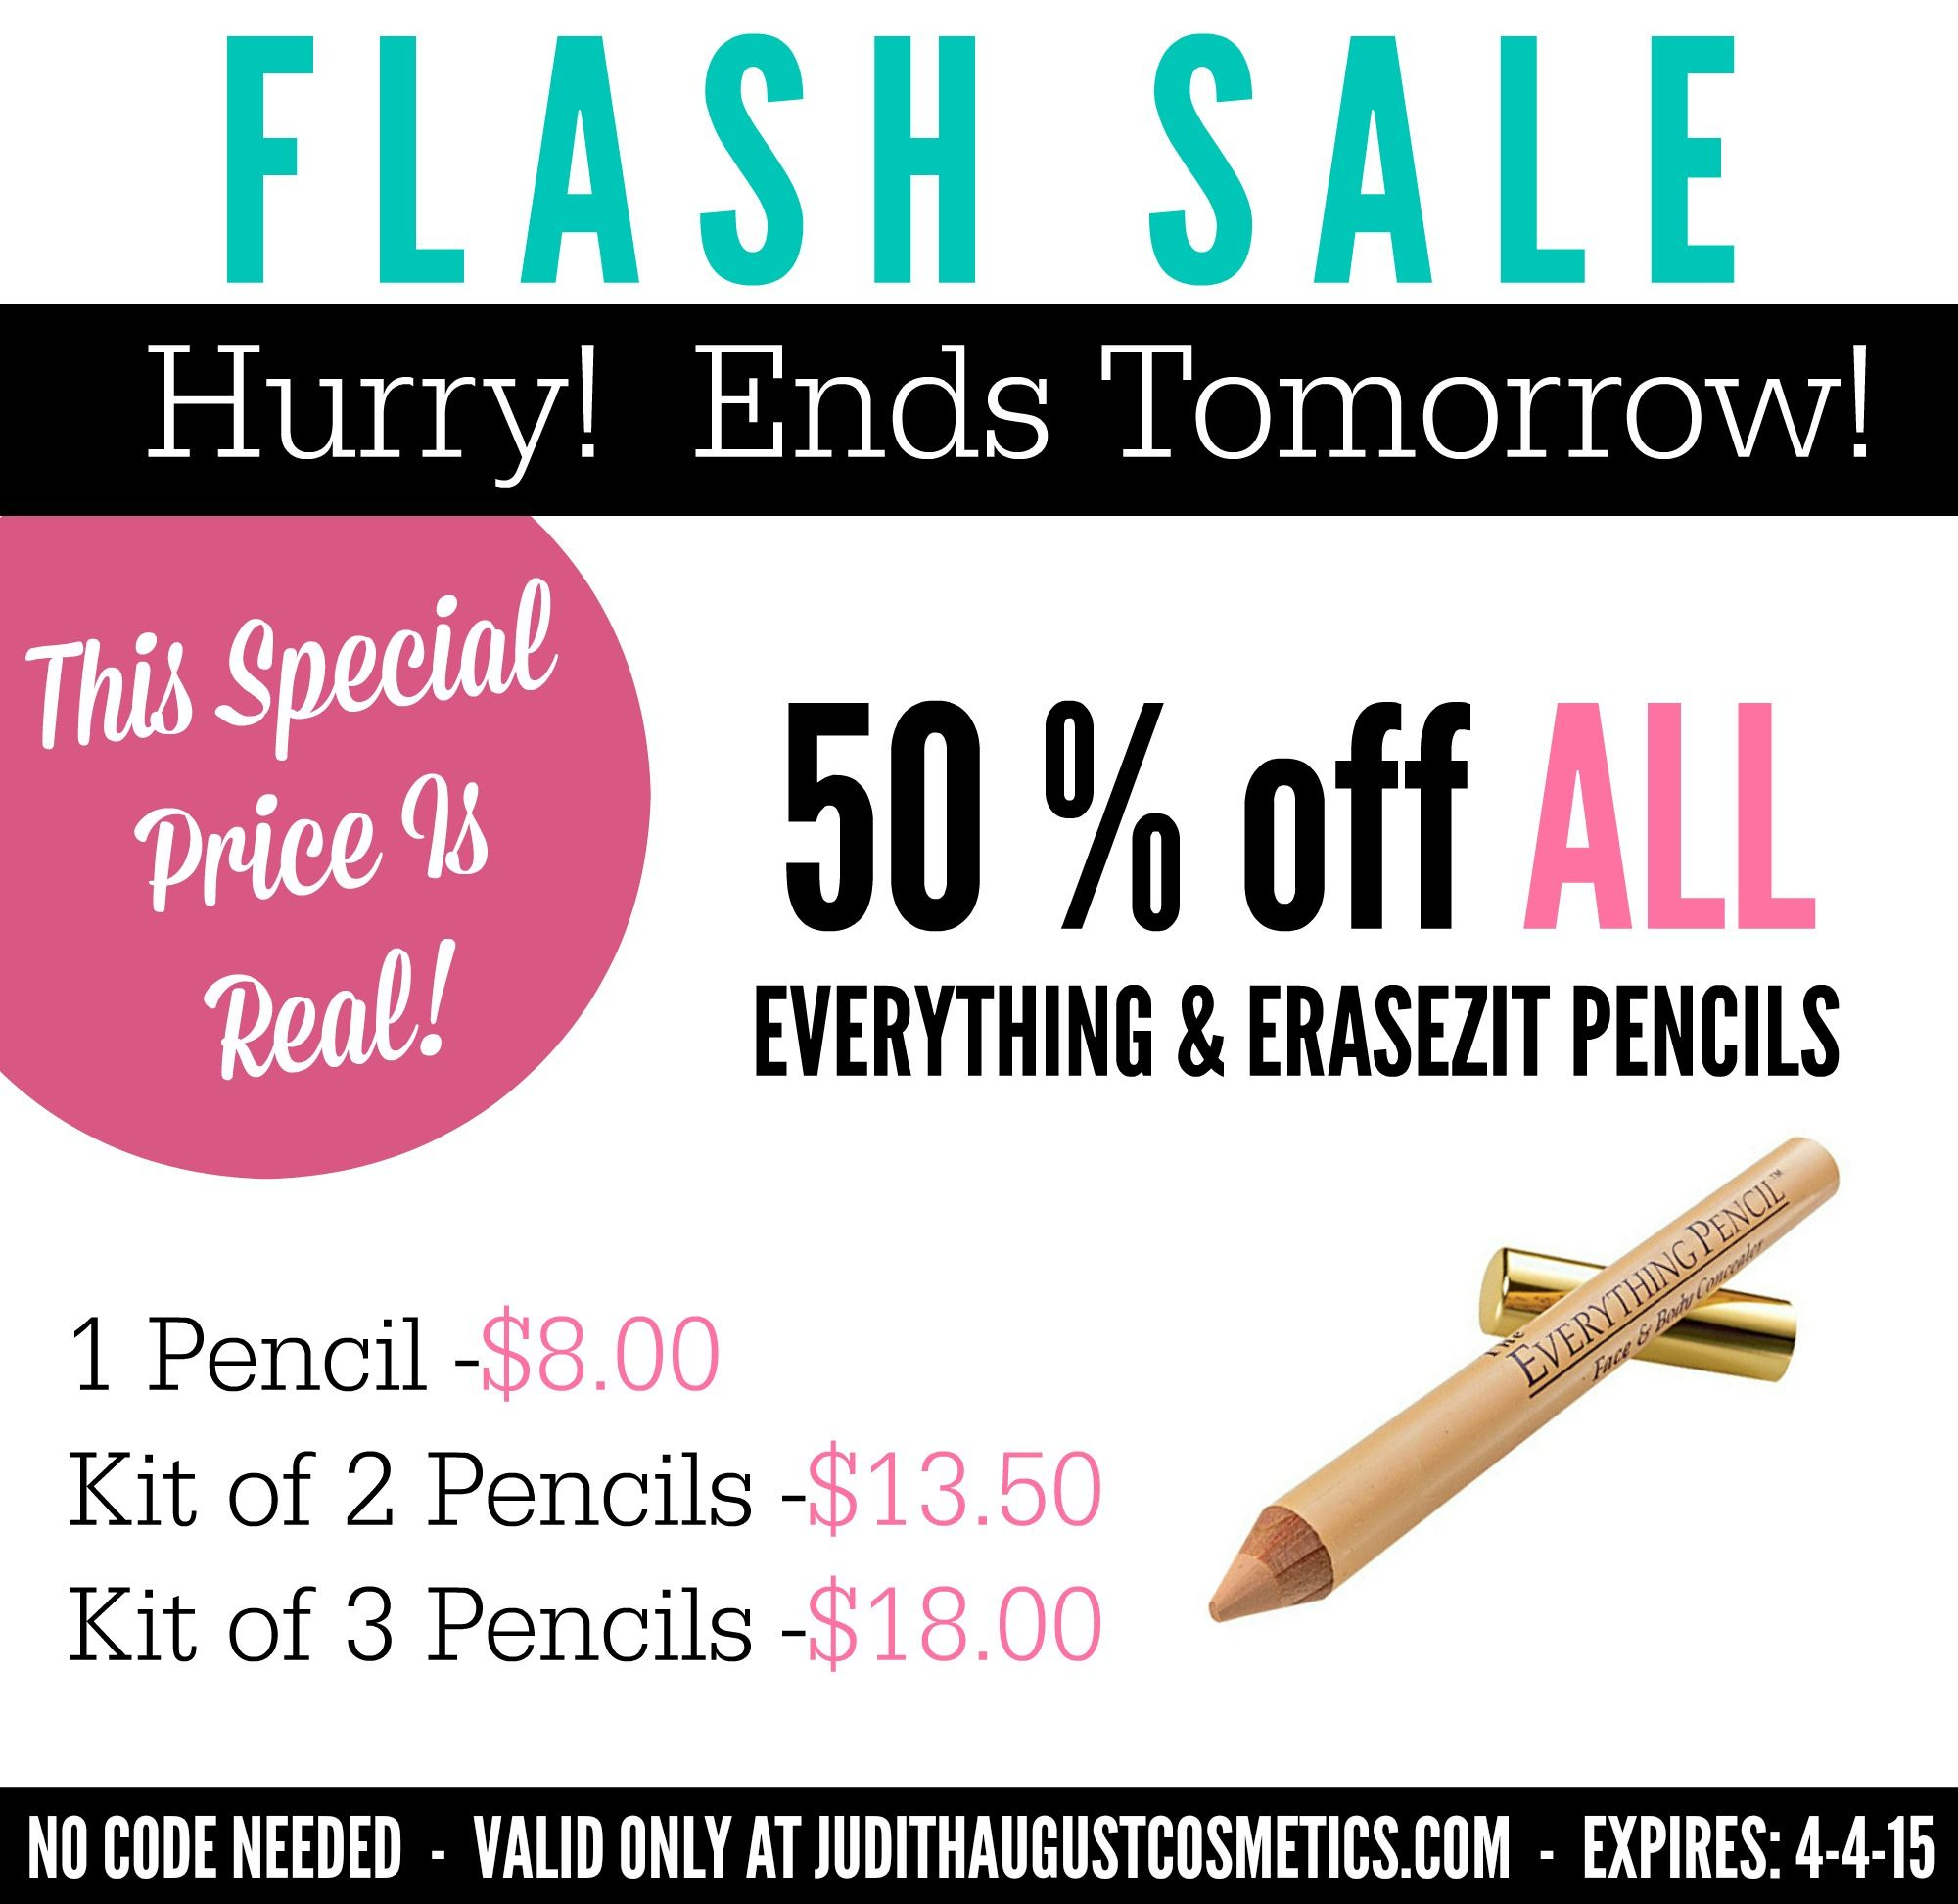 Flash Sale!  50% off All EraseZit & Everything Concealer Pencils!  ends tomorrow 4-4-15 #bestconcealer #bestfoundation #makeup #concealertips #makeuptips #highlightandcontour #beautytips #skincare #acnemakeup #acneconcealer #booboos #eyeshadow #lipstick